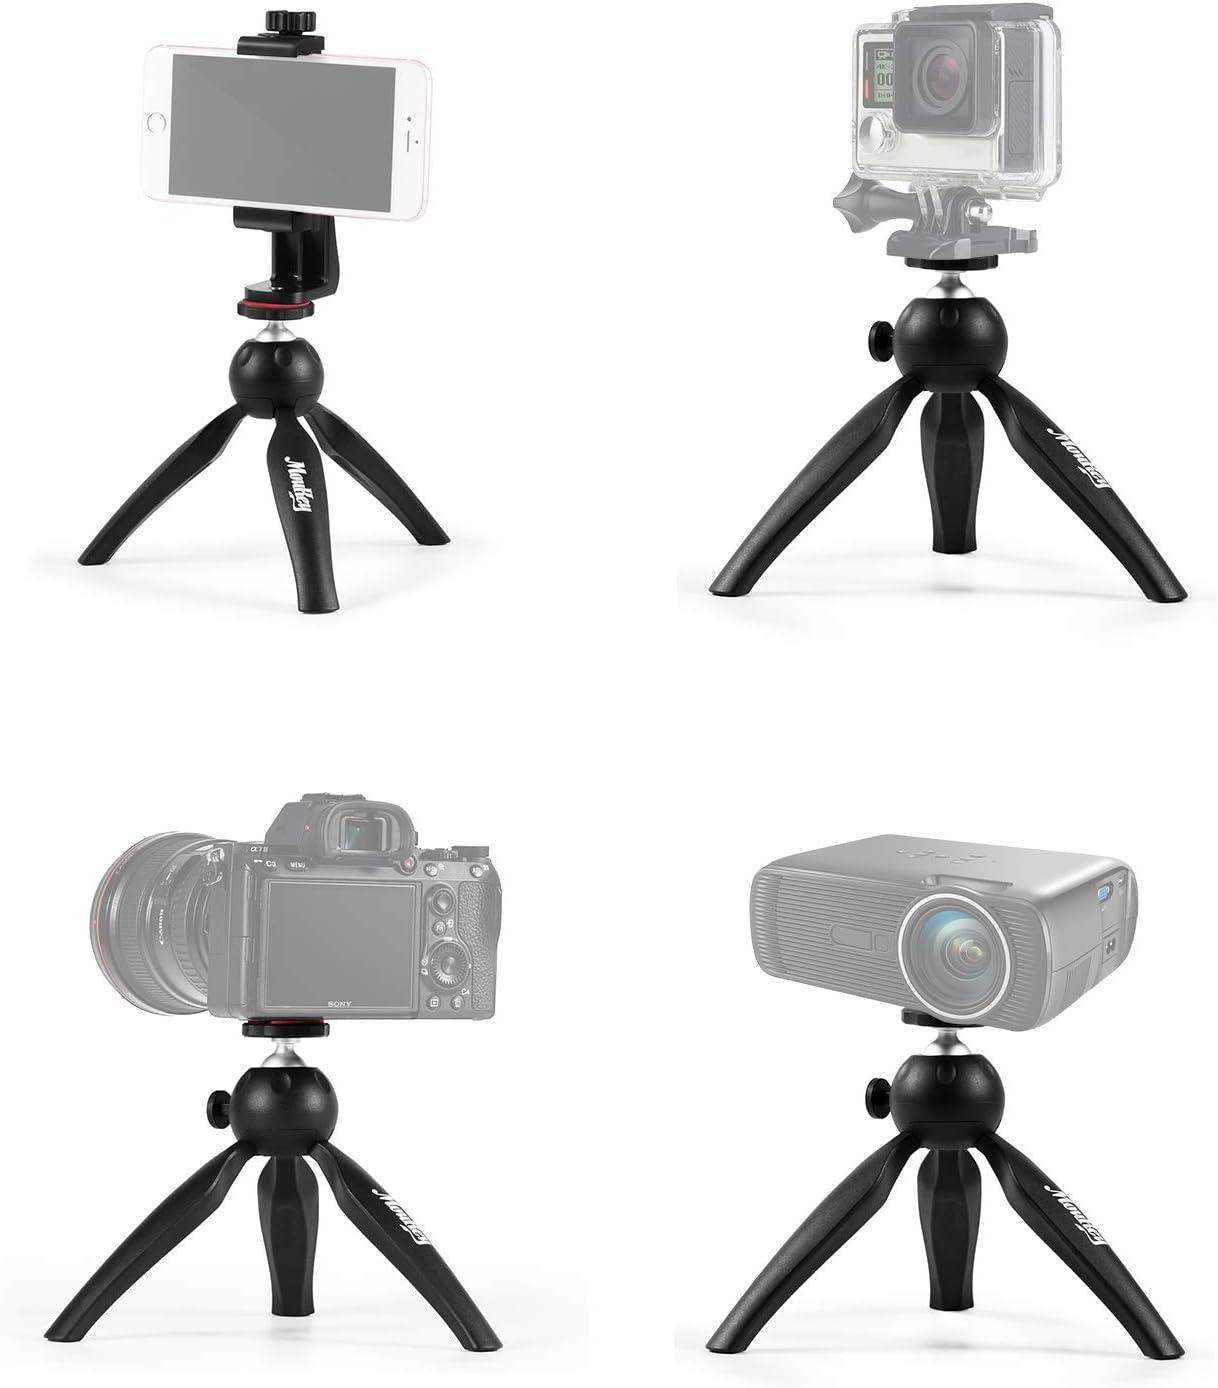 Advanced Small Phone Tripod Stand for iPhone//Samsung Smartphone GoPro Webcam Projector Small Digital SLR Camera Desktop Phone Stand Desktop Tripod Moukey MPSBK1 Mini Tripod Camera//Mobile Holder